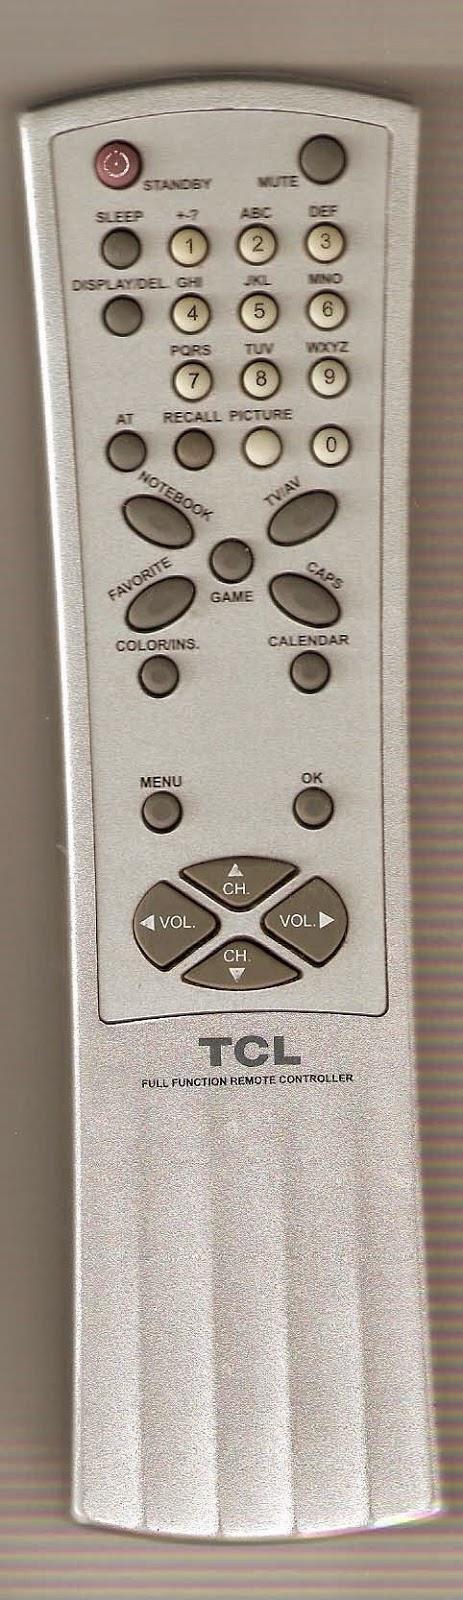 control remoto tv televisor TCL TCL-21E11A